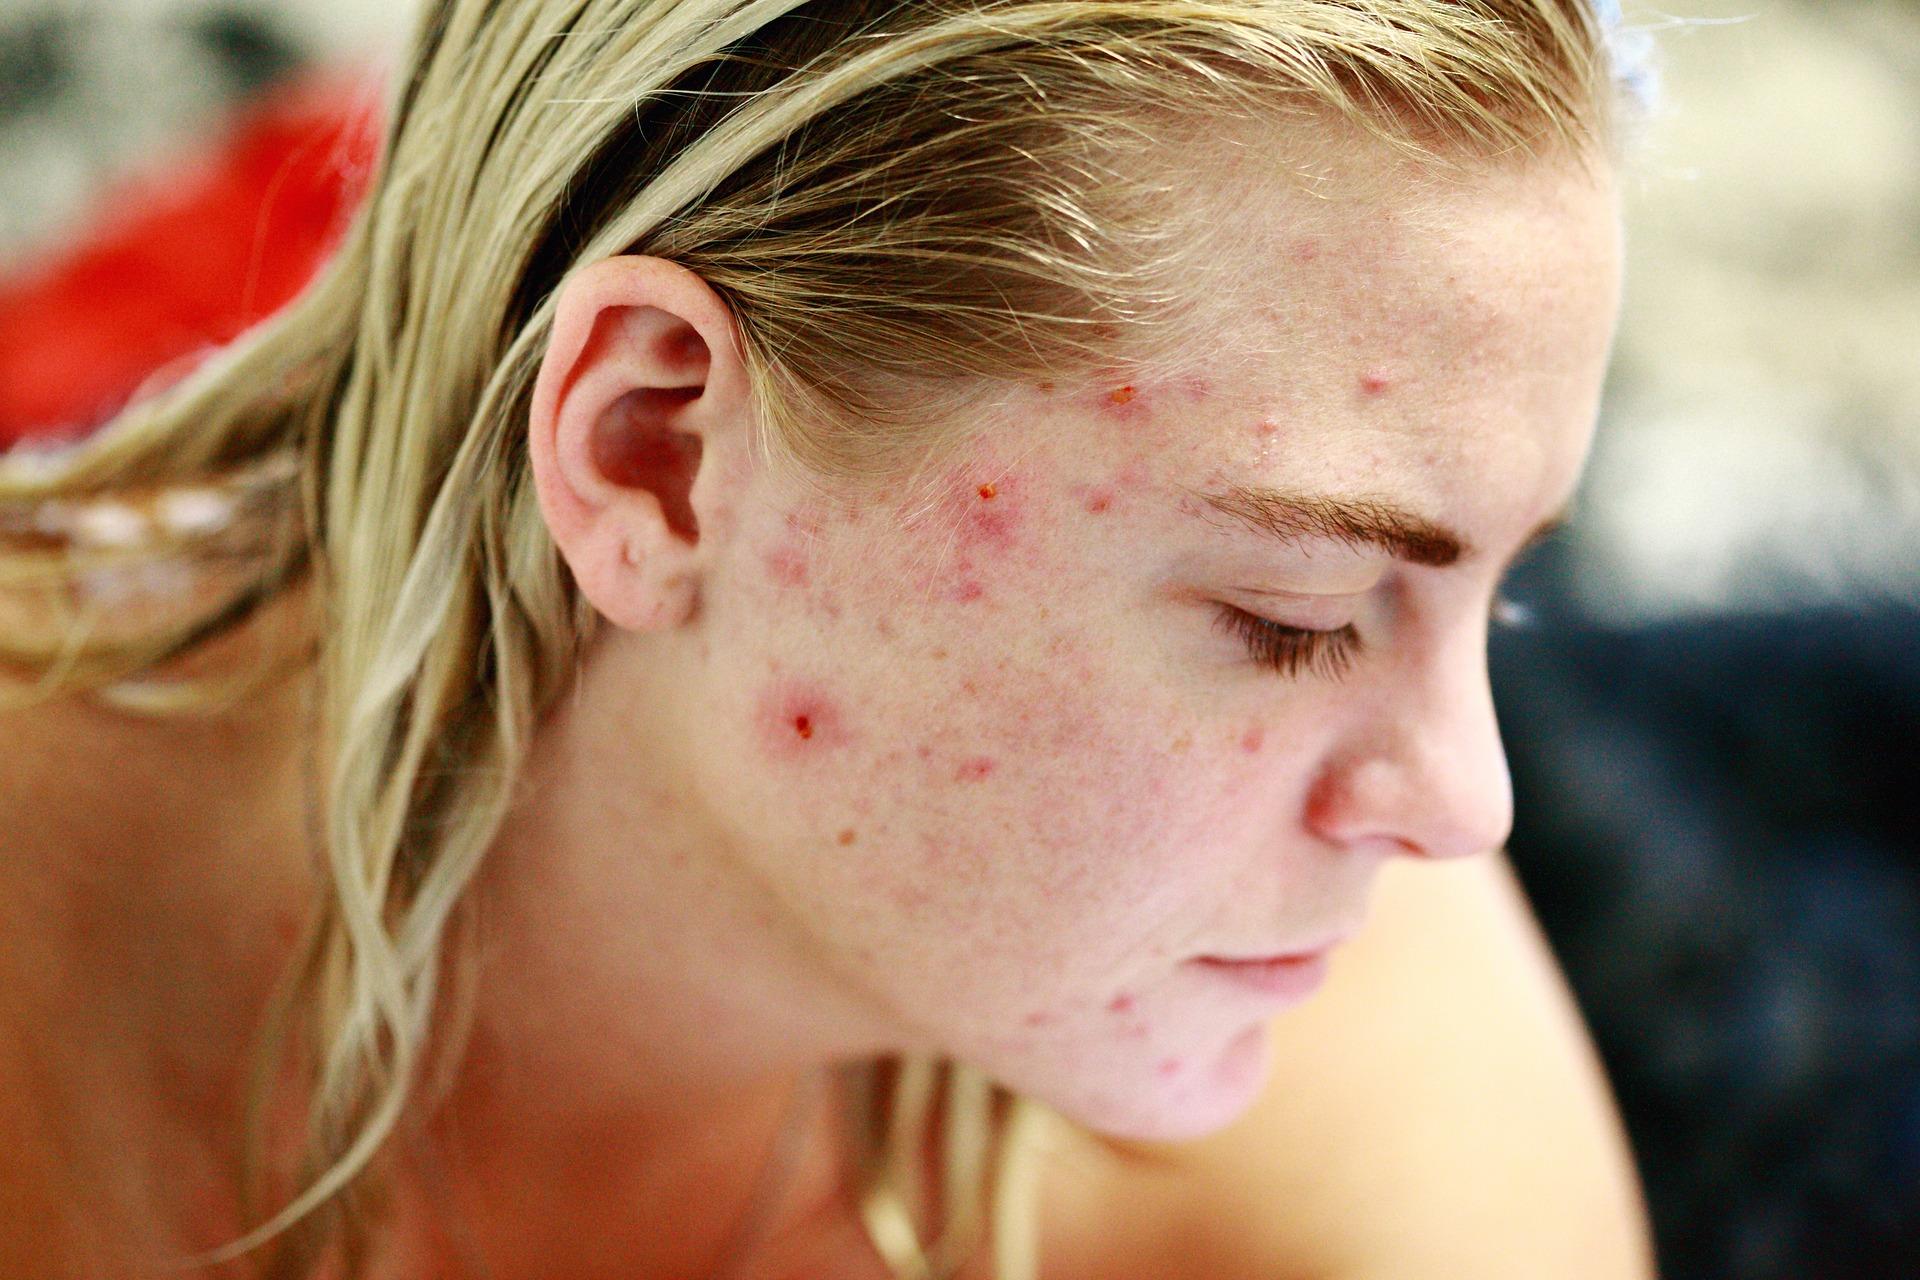 ragazza affetta da acne